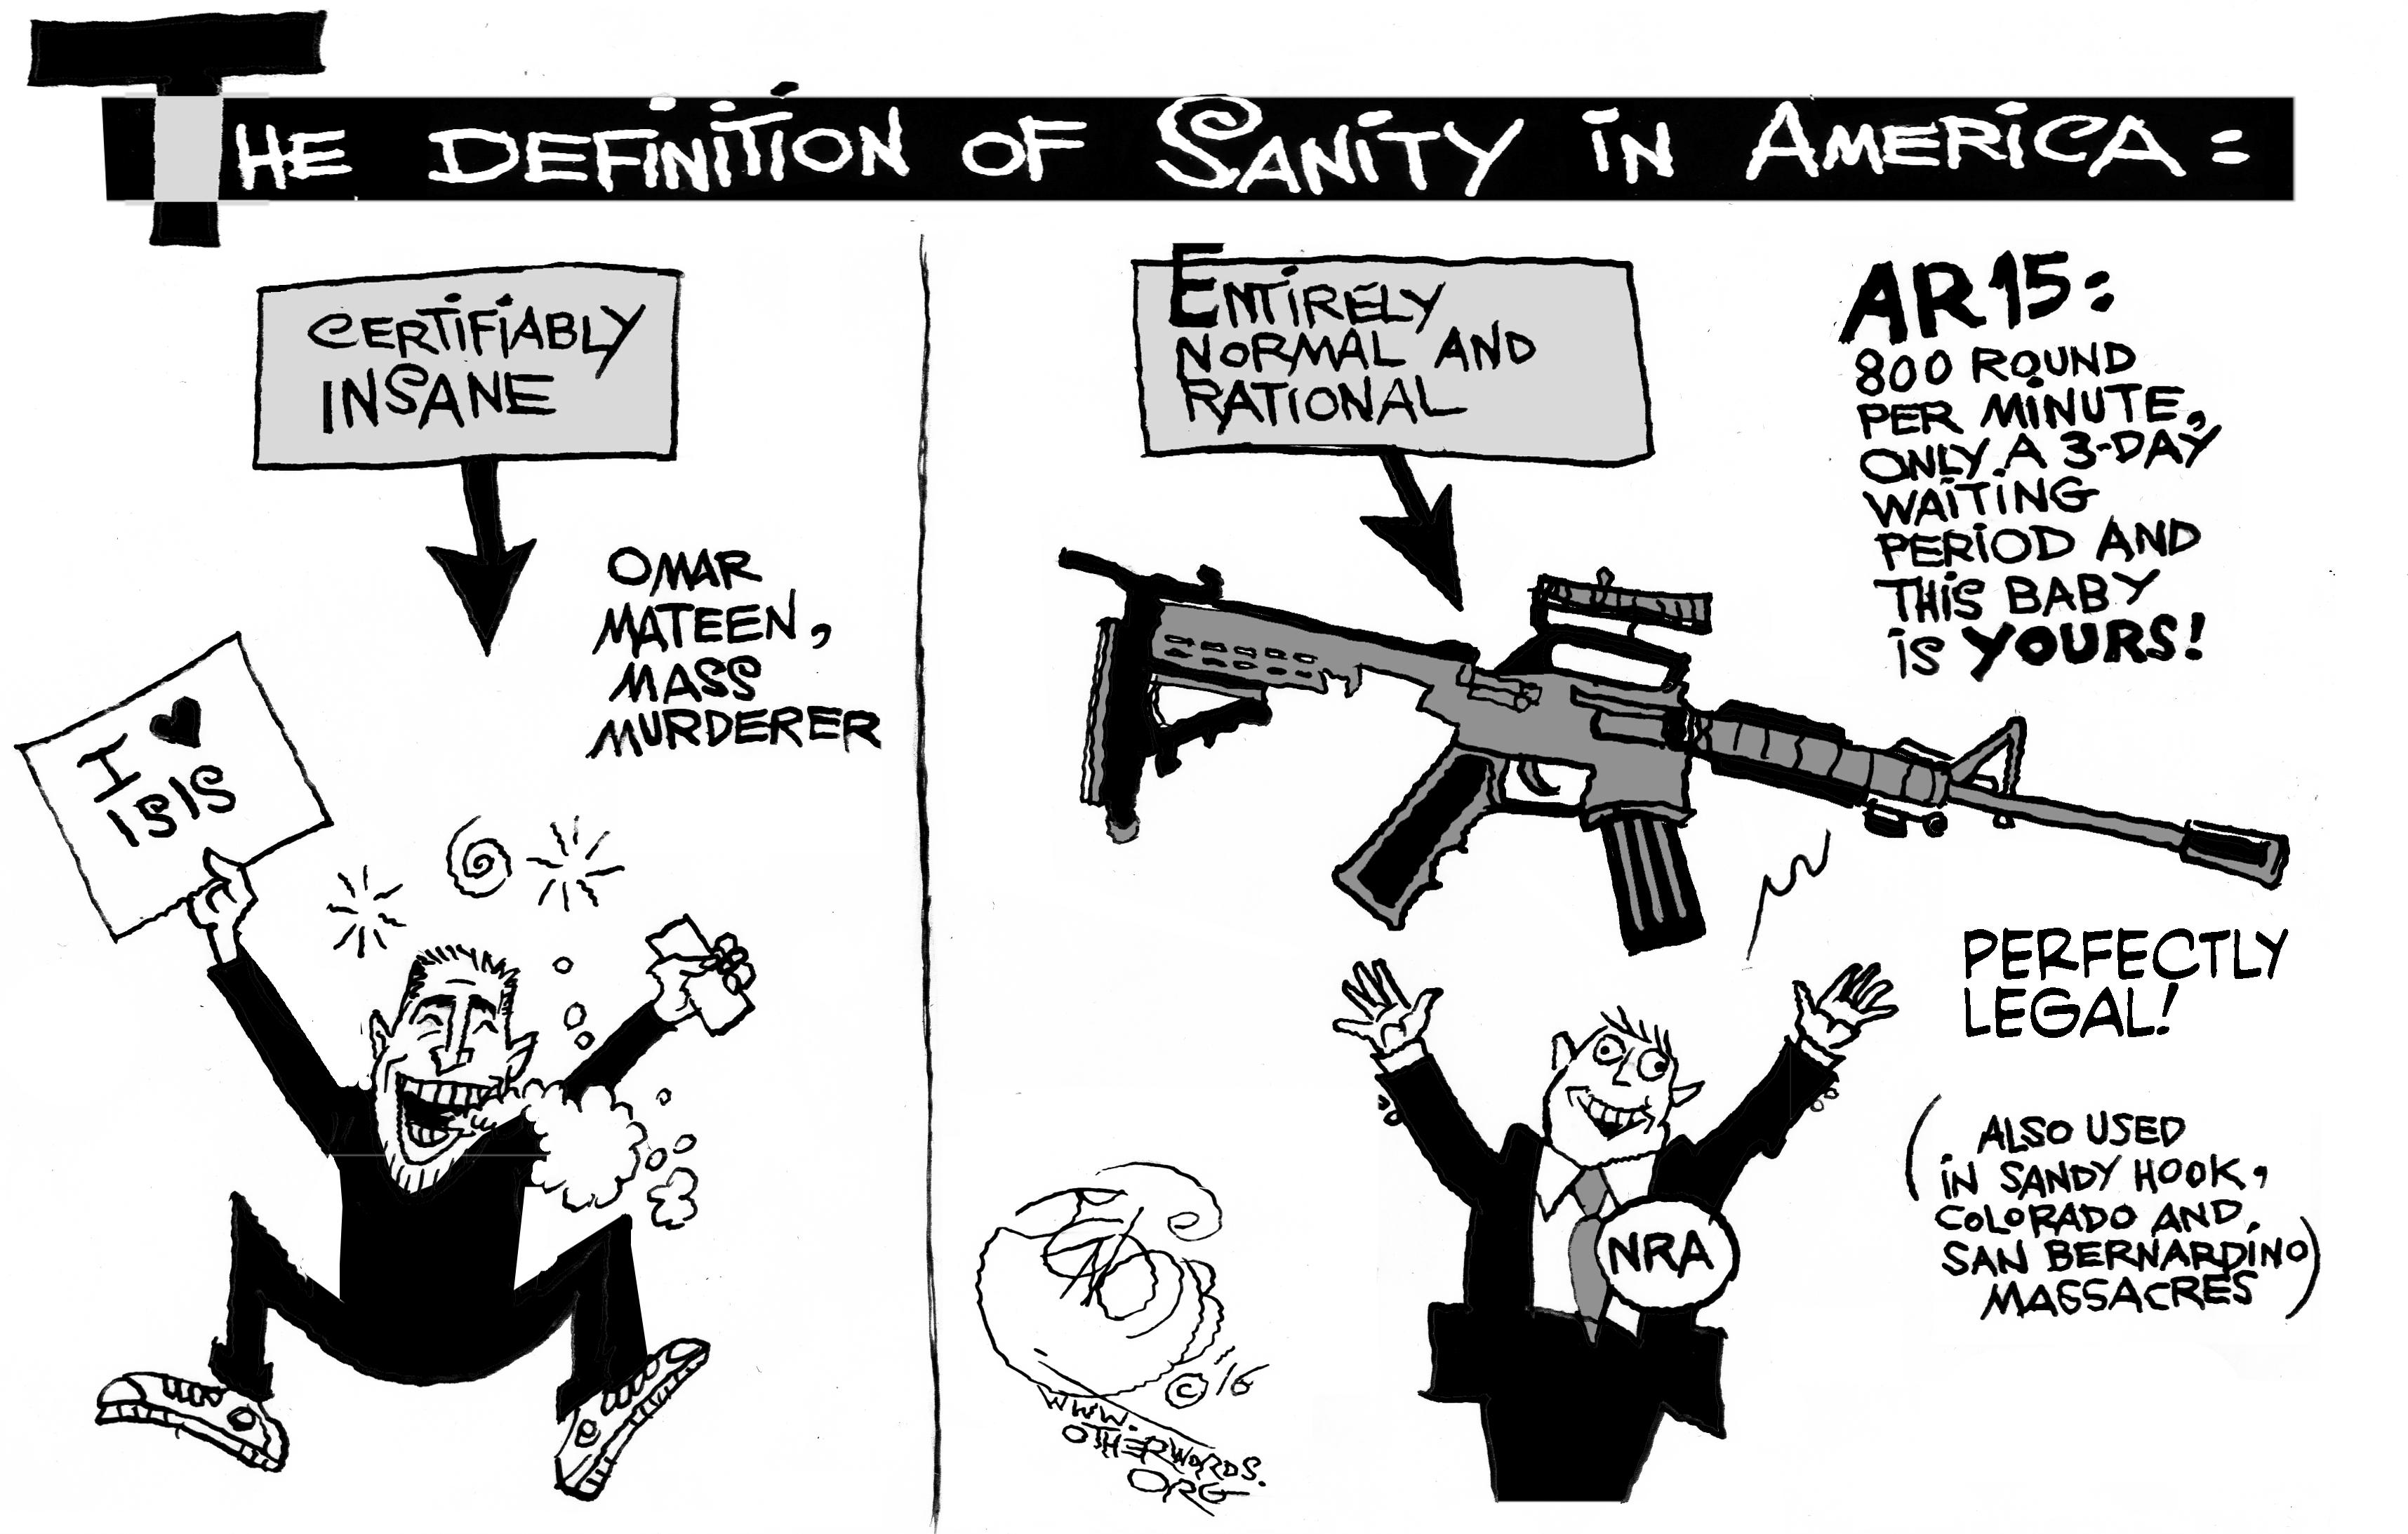 A 'Good Guy With a Gun' Isn't Enough